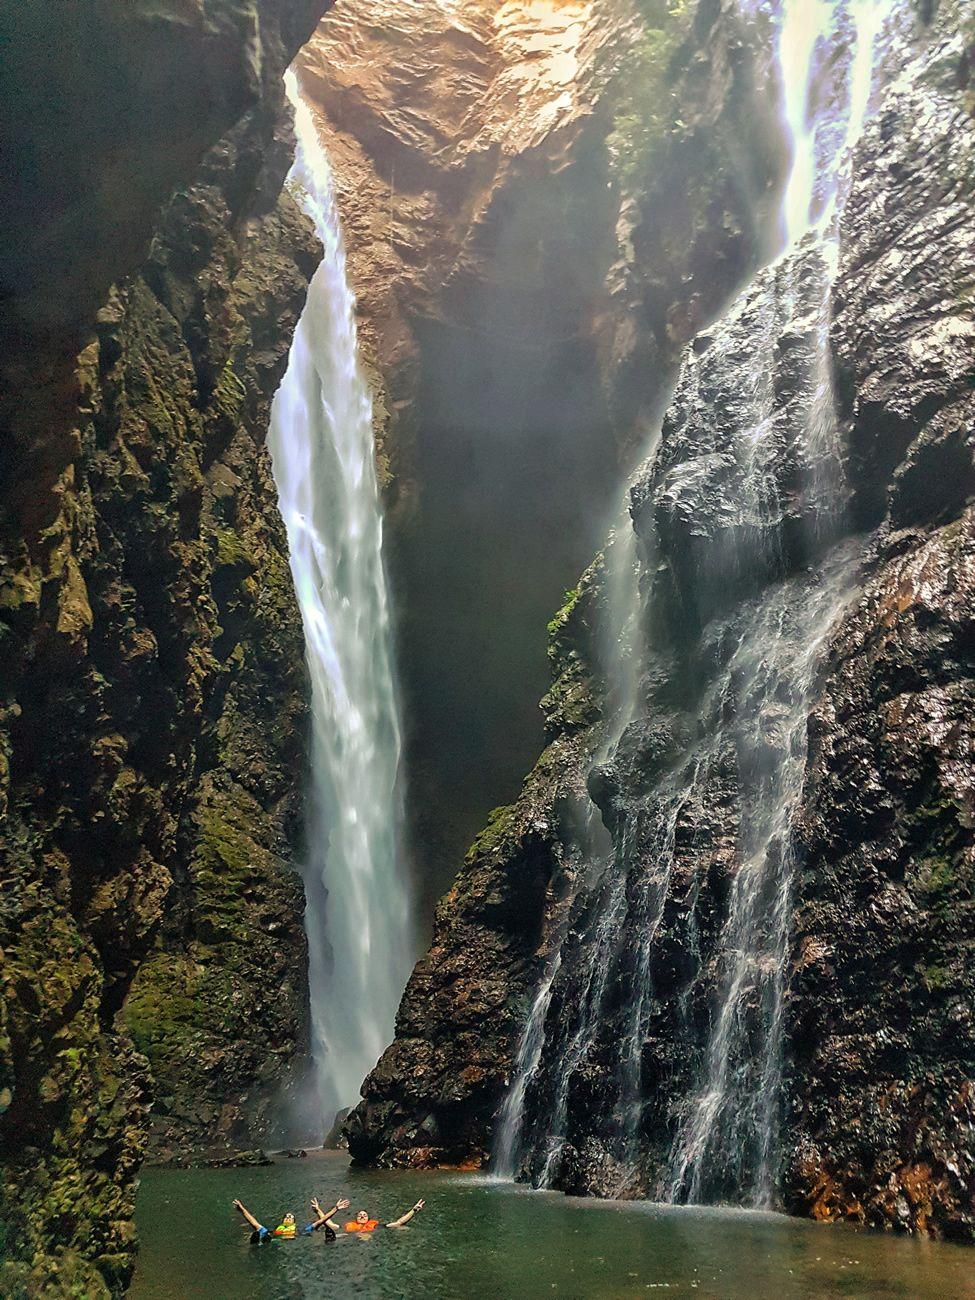 Cachoeira Do Dragao Chapada Dos Veadeiros Goias Cachoeira